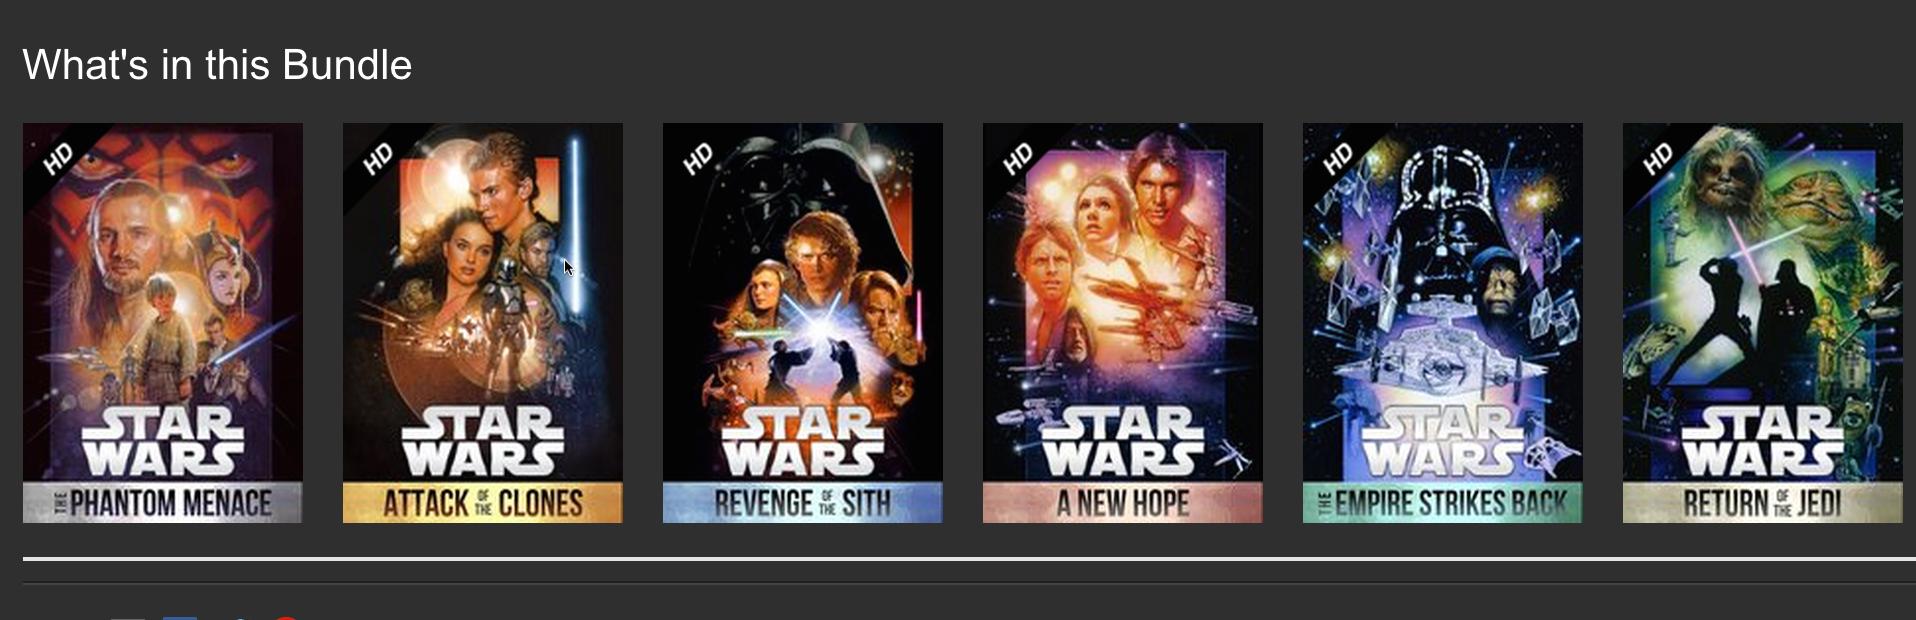 John williams' star wars 7 soundtrack free download guide/tips.